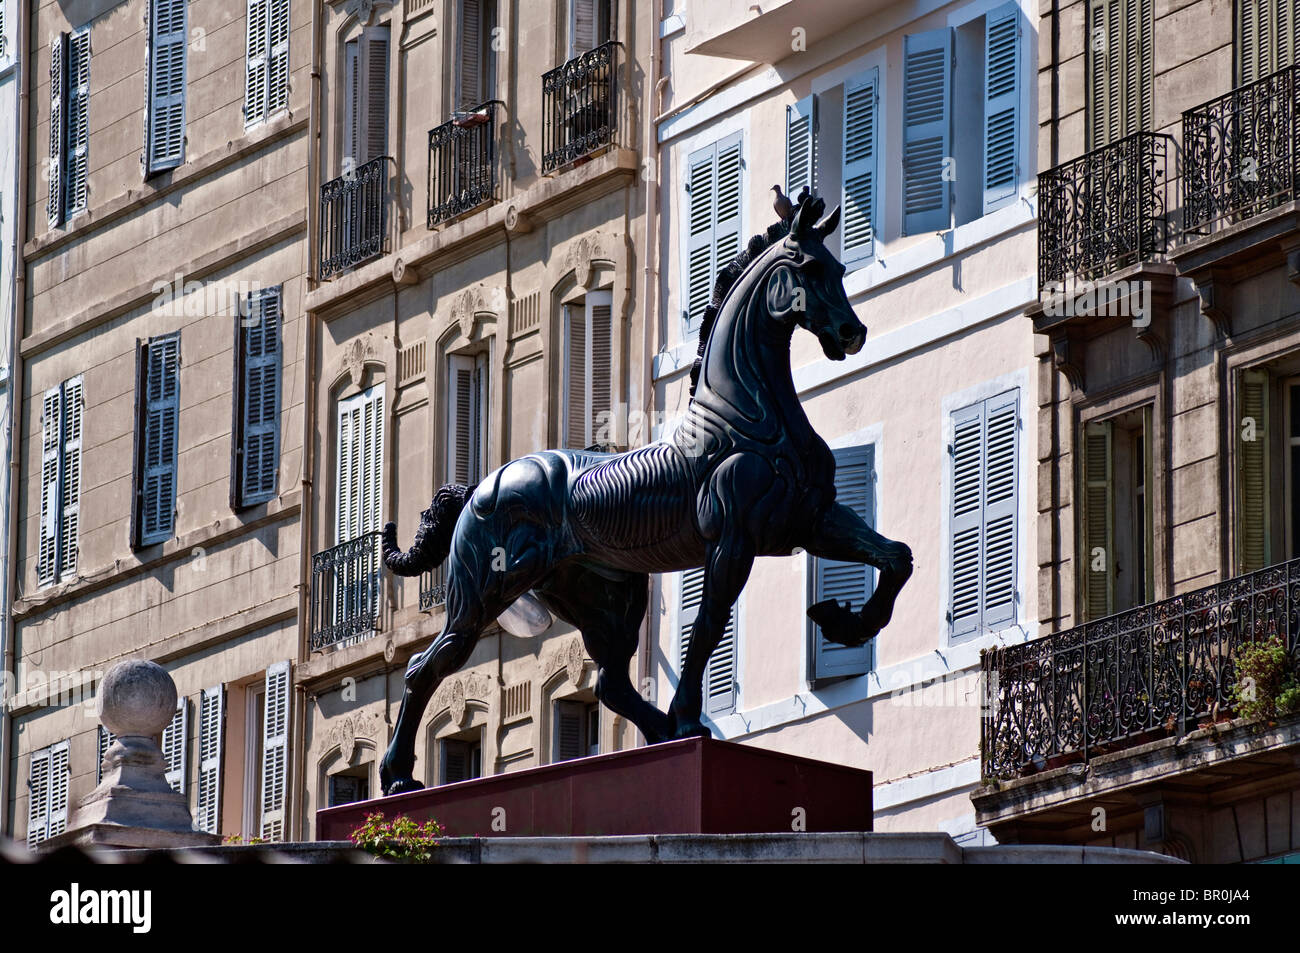 Denver Horse Statue Stock Photos & Denver Horse Statue Stock Images ...